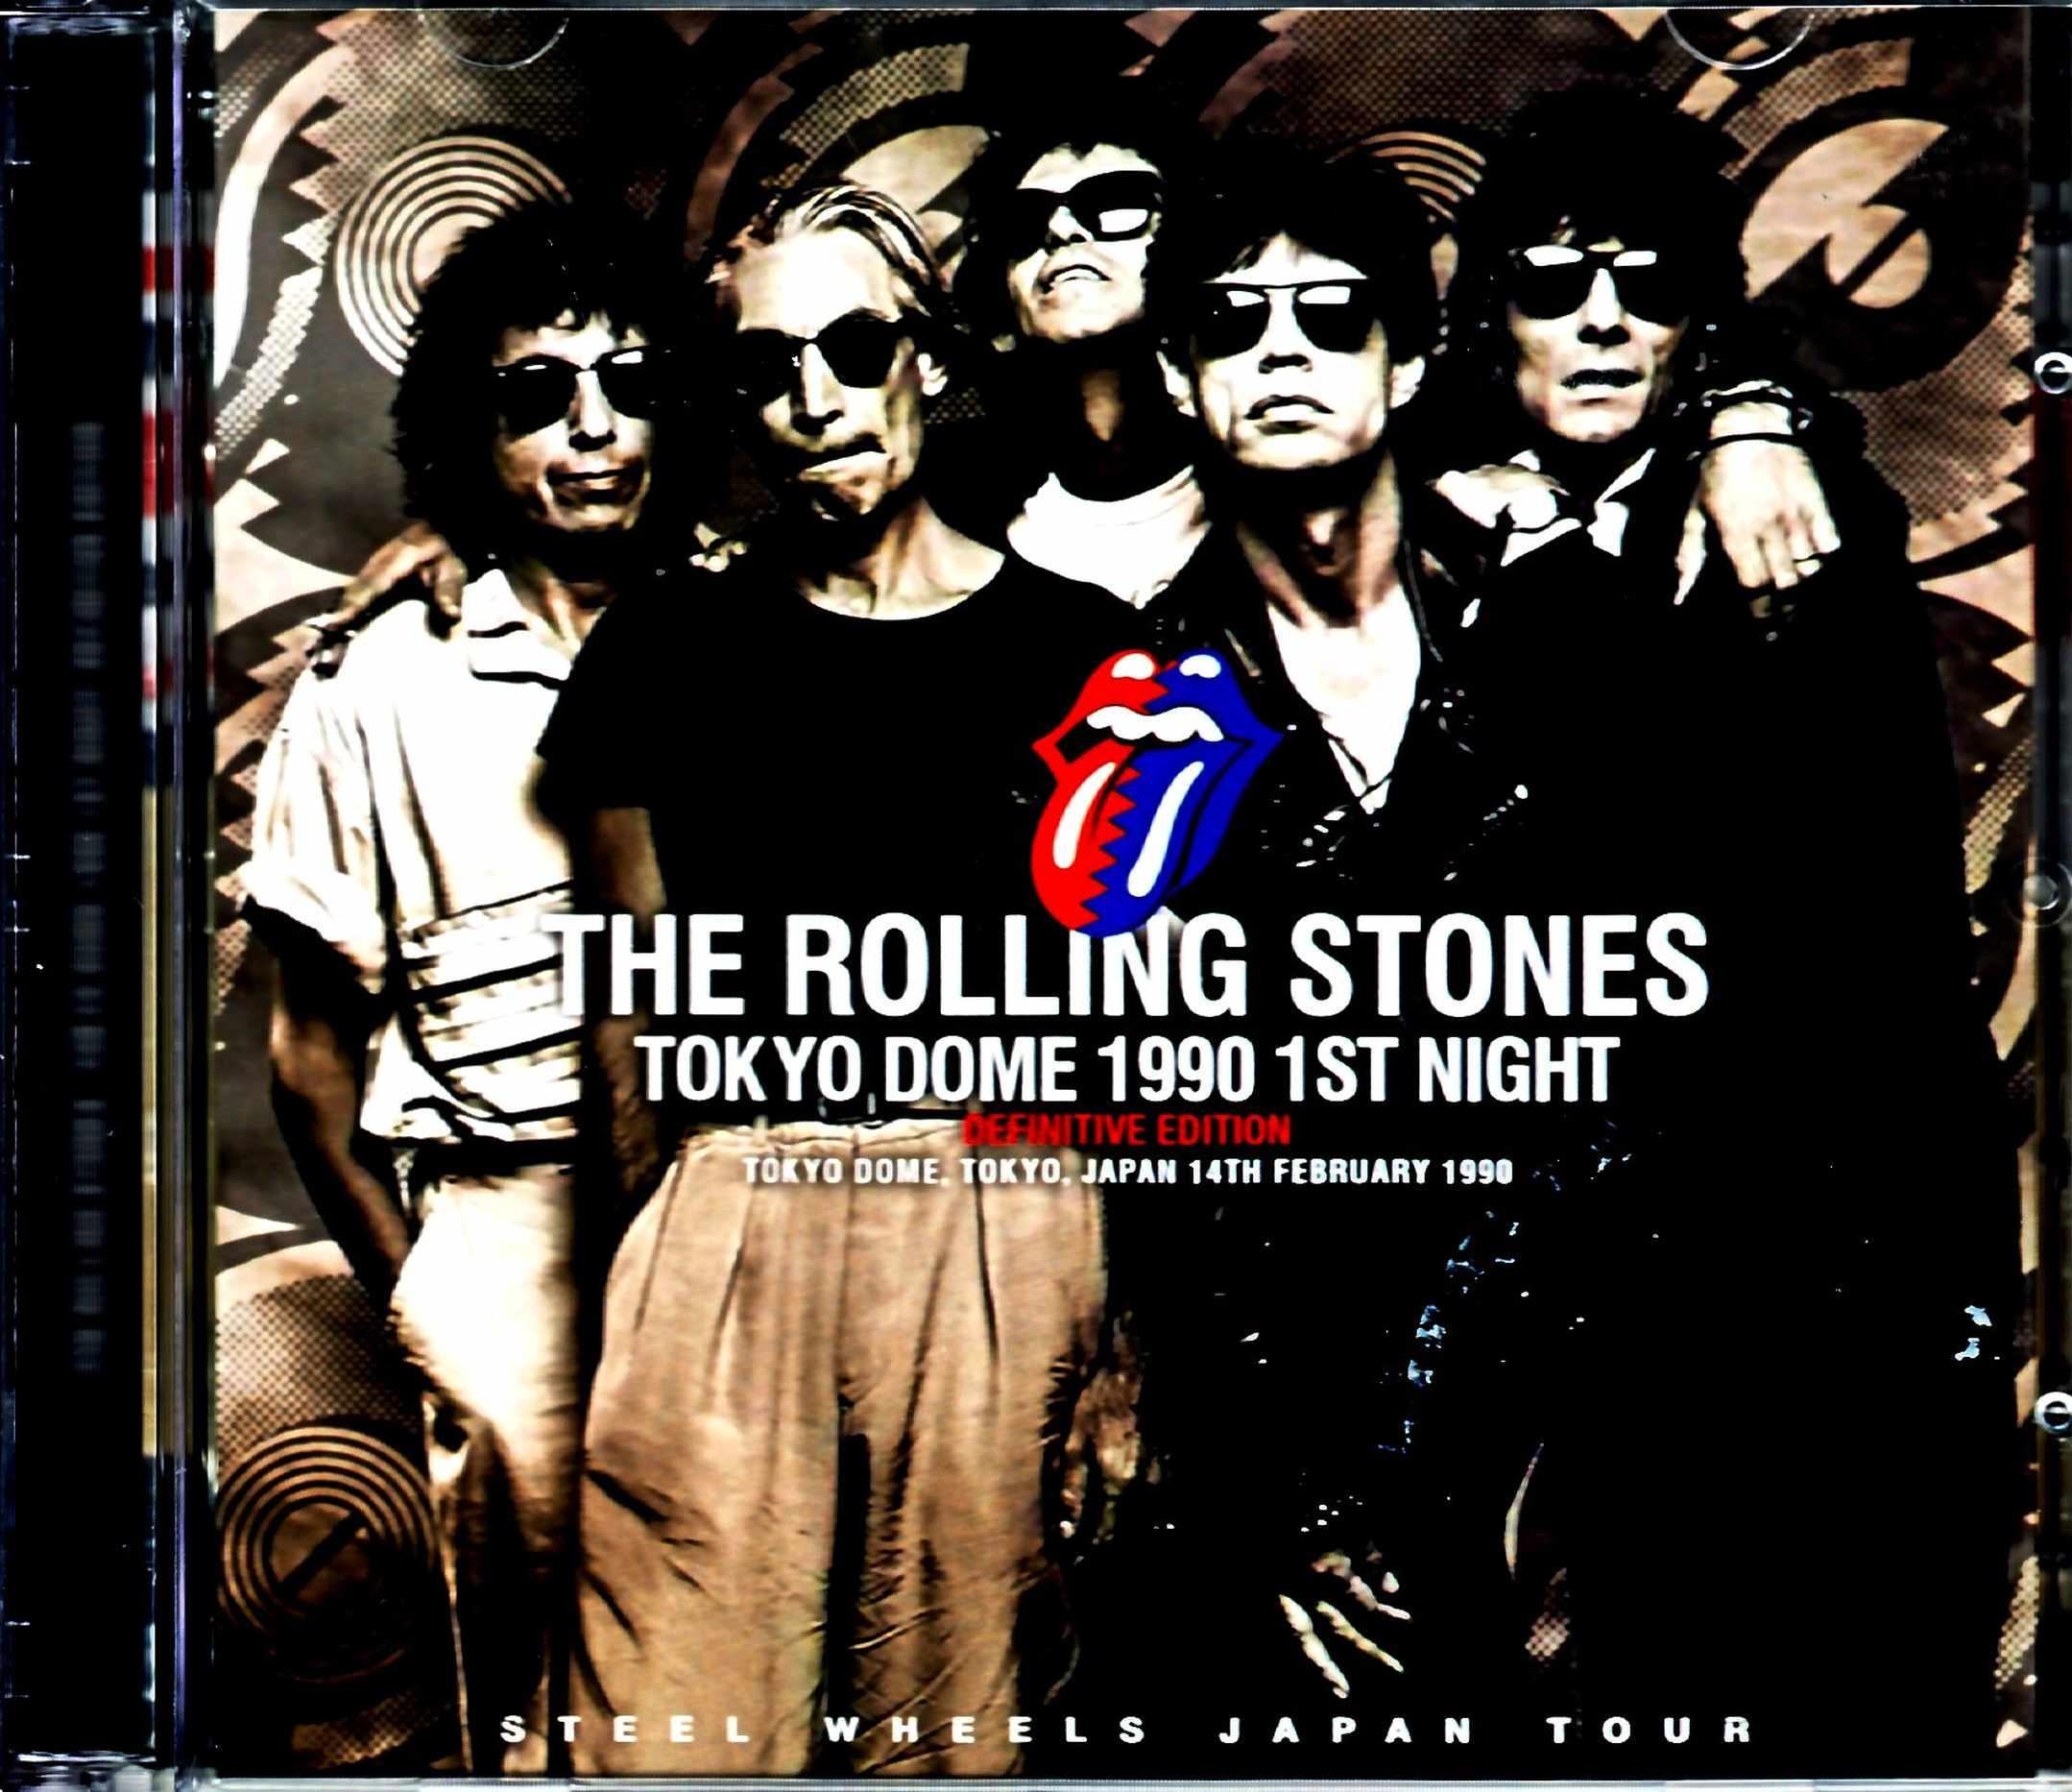 Rolling Stones ローリング・ストーンズ/Tokyo,Japan 2.14.1990 Upgrade